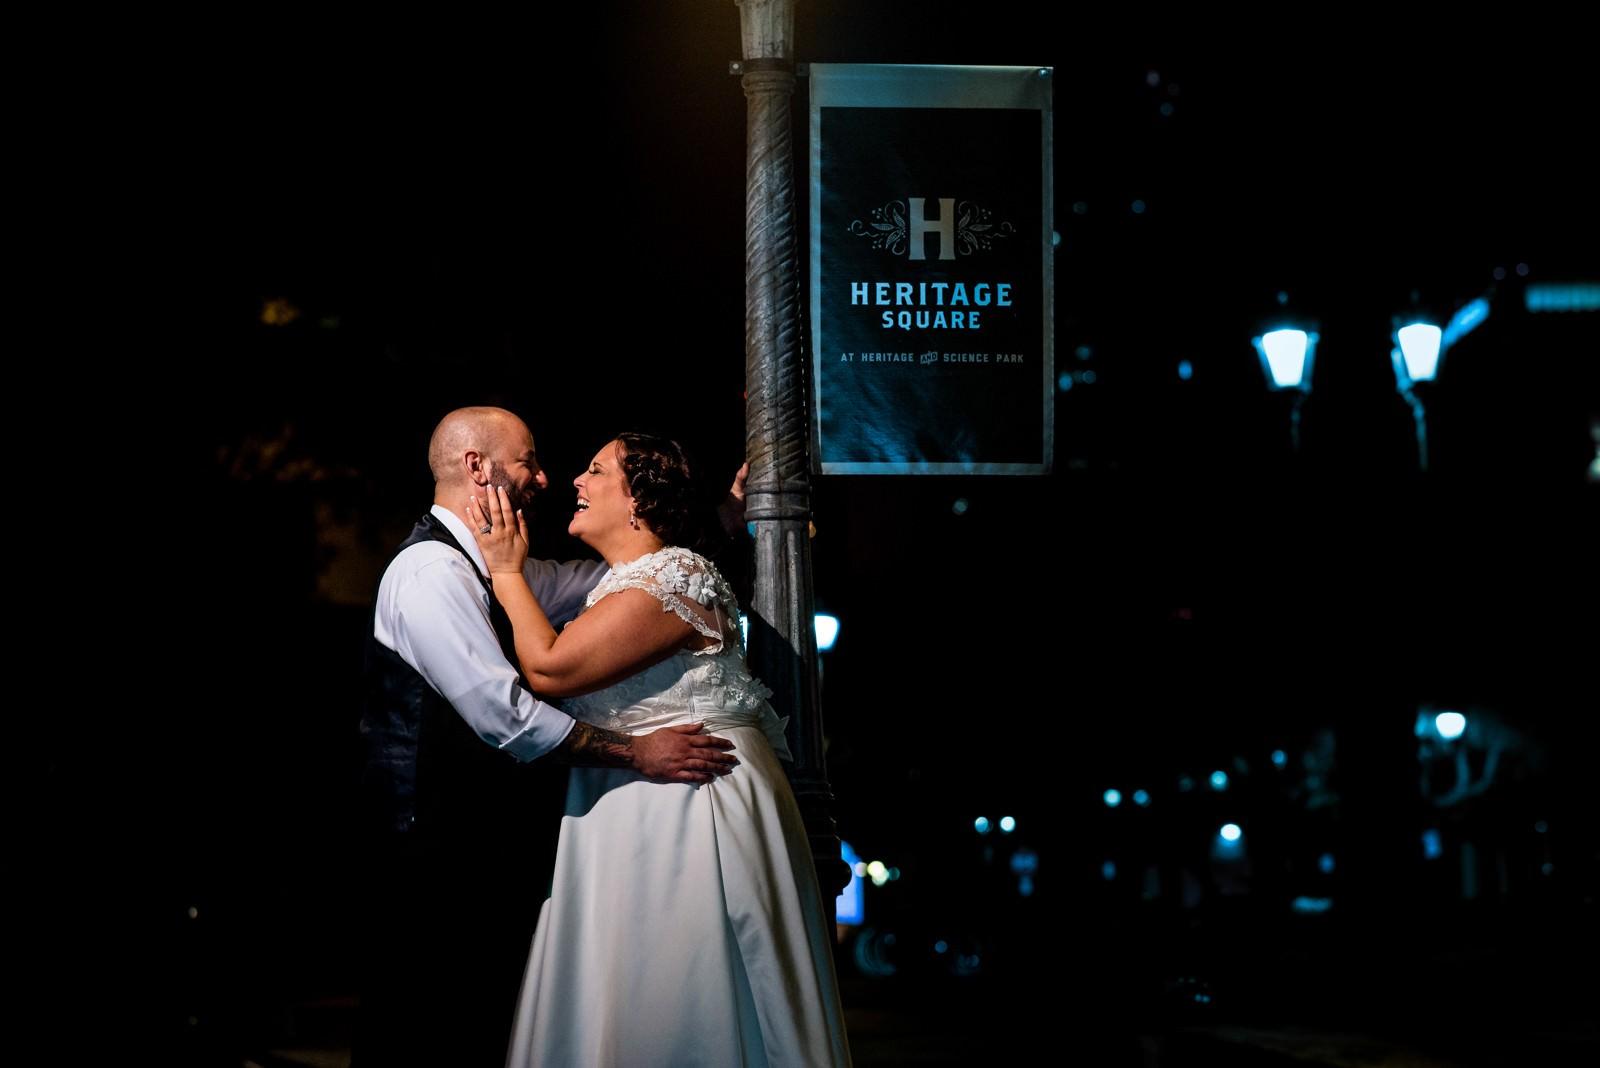 phoenix-heritage-square-wedding-phoenix-wedding-photographers-67